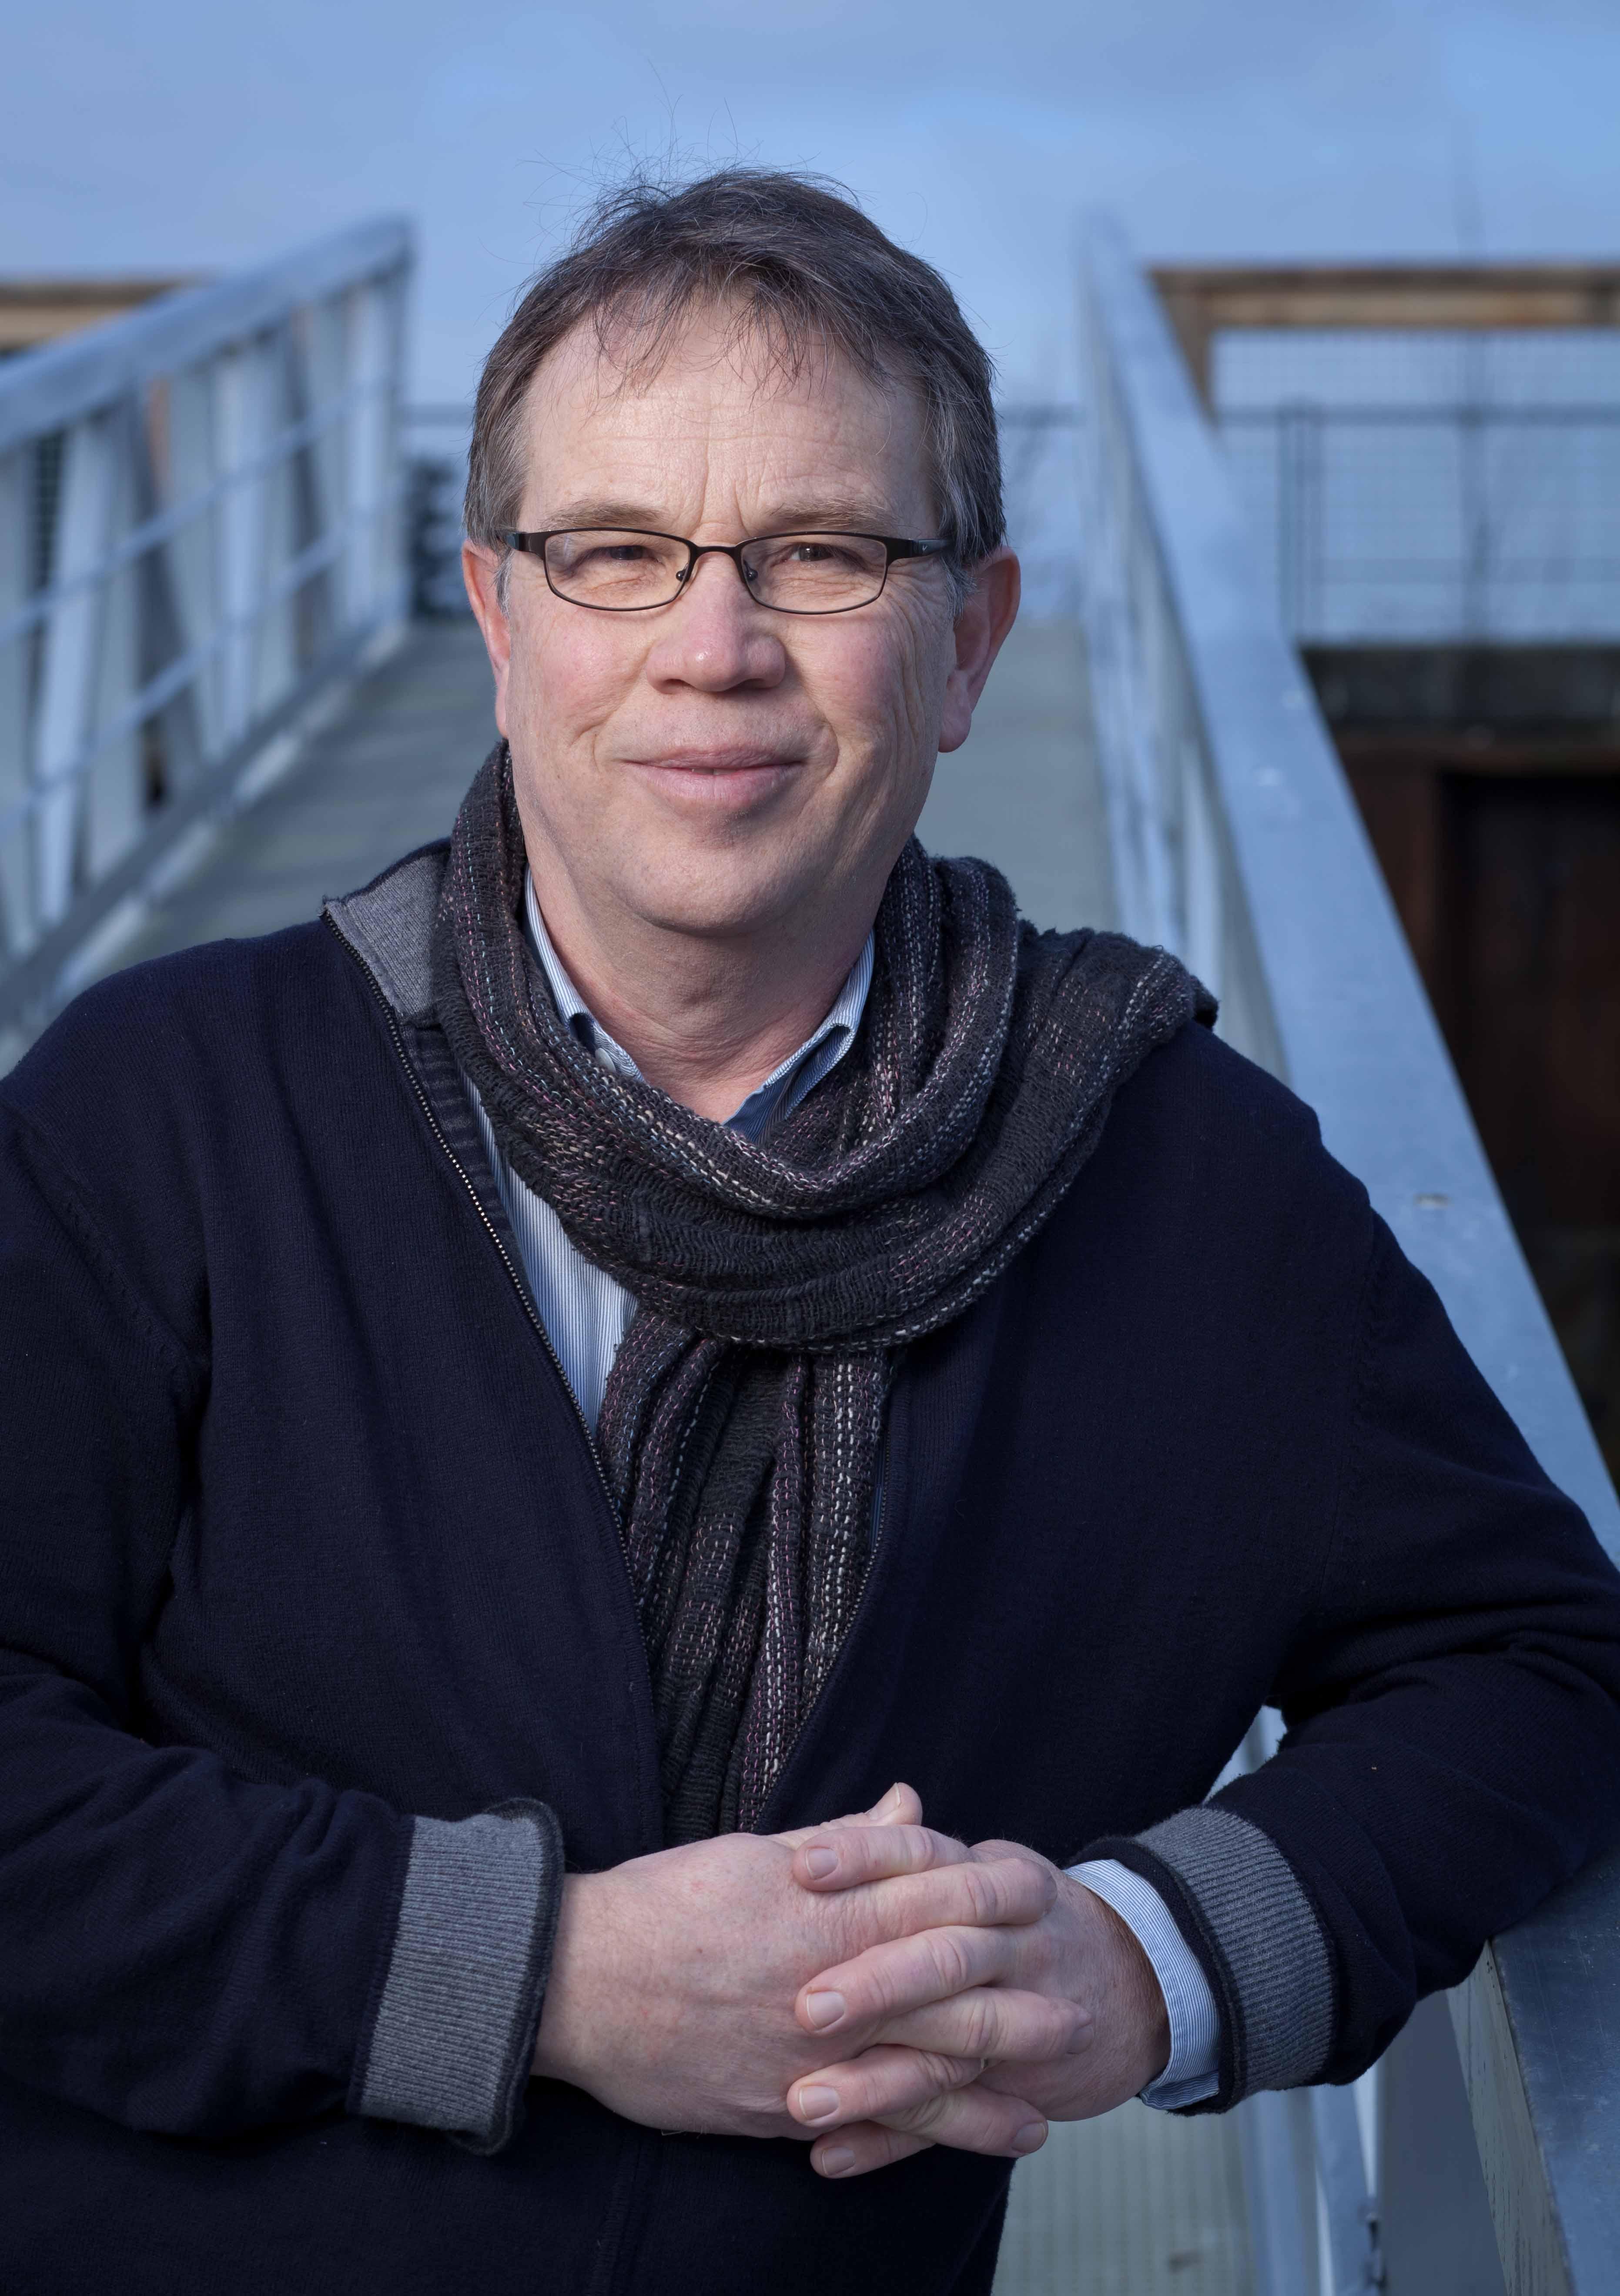 Ian Finlayson